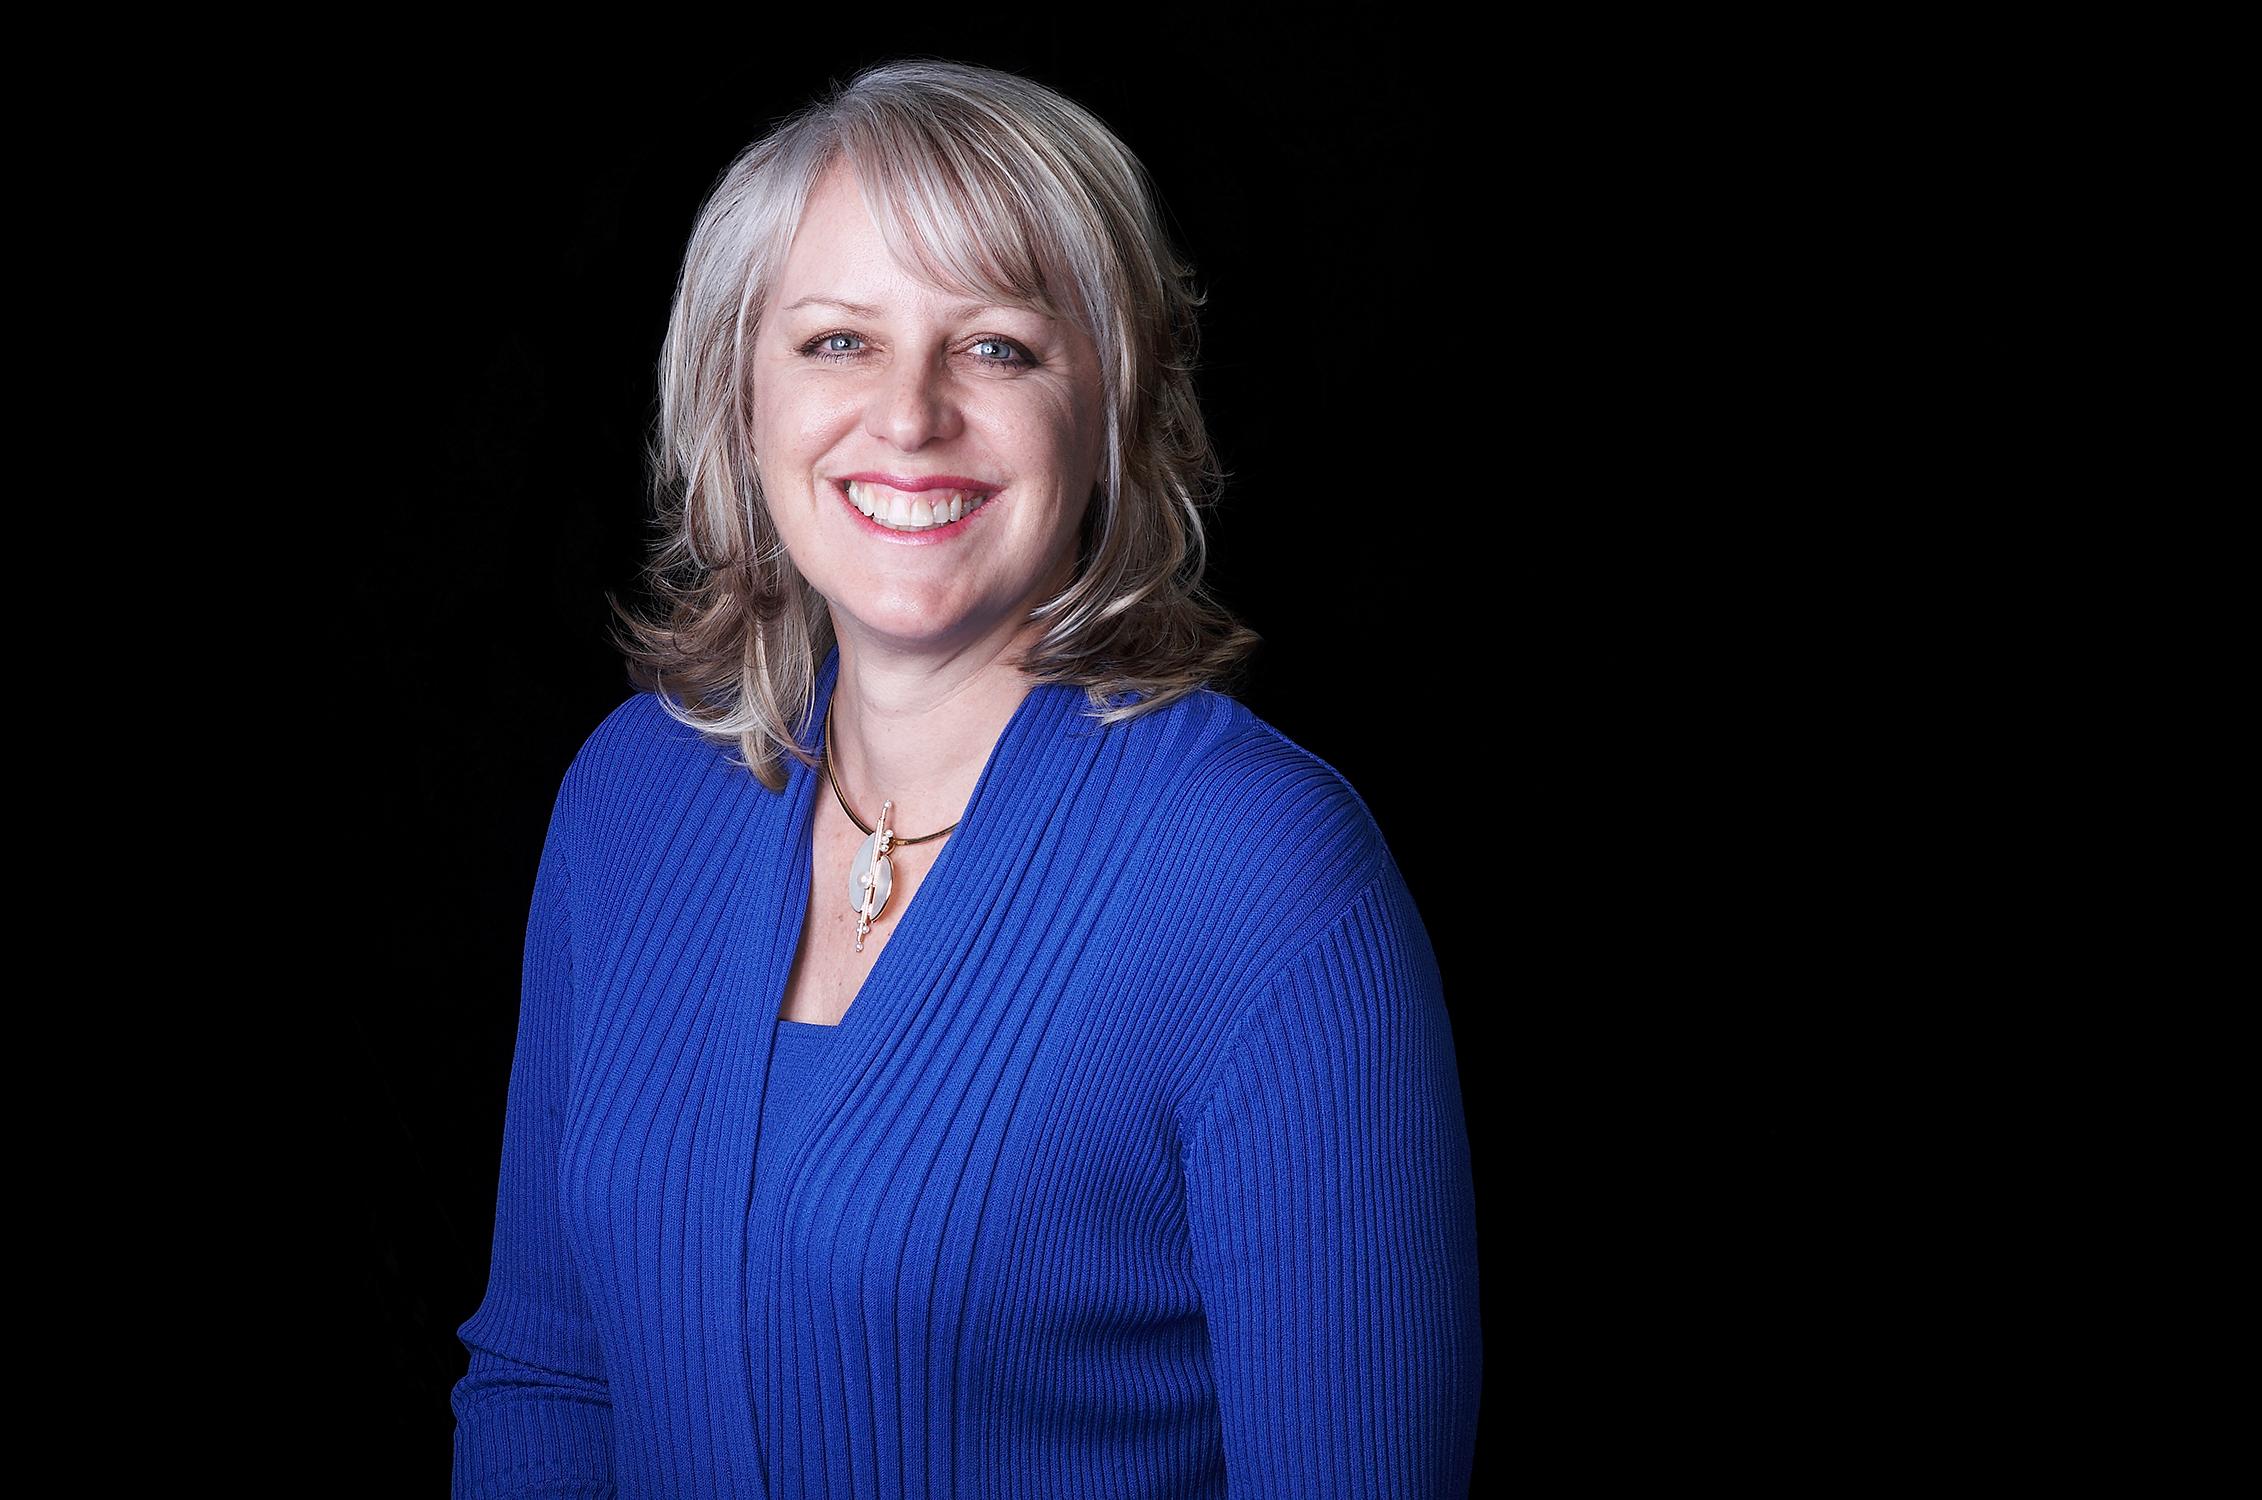 Dr.-Julie-Hodge-CALIFORNIA-PROFILE-PORTRAIT-BY-JONATHAN-R-BECKERMAN-PHOTOGRAPHY.jpg